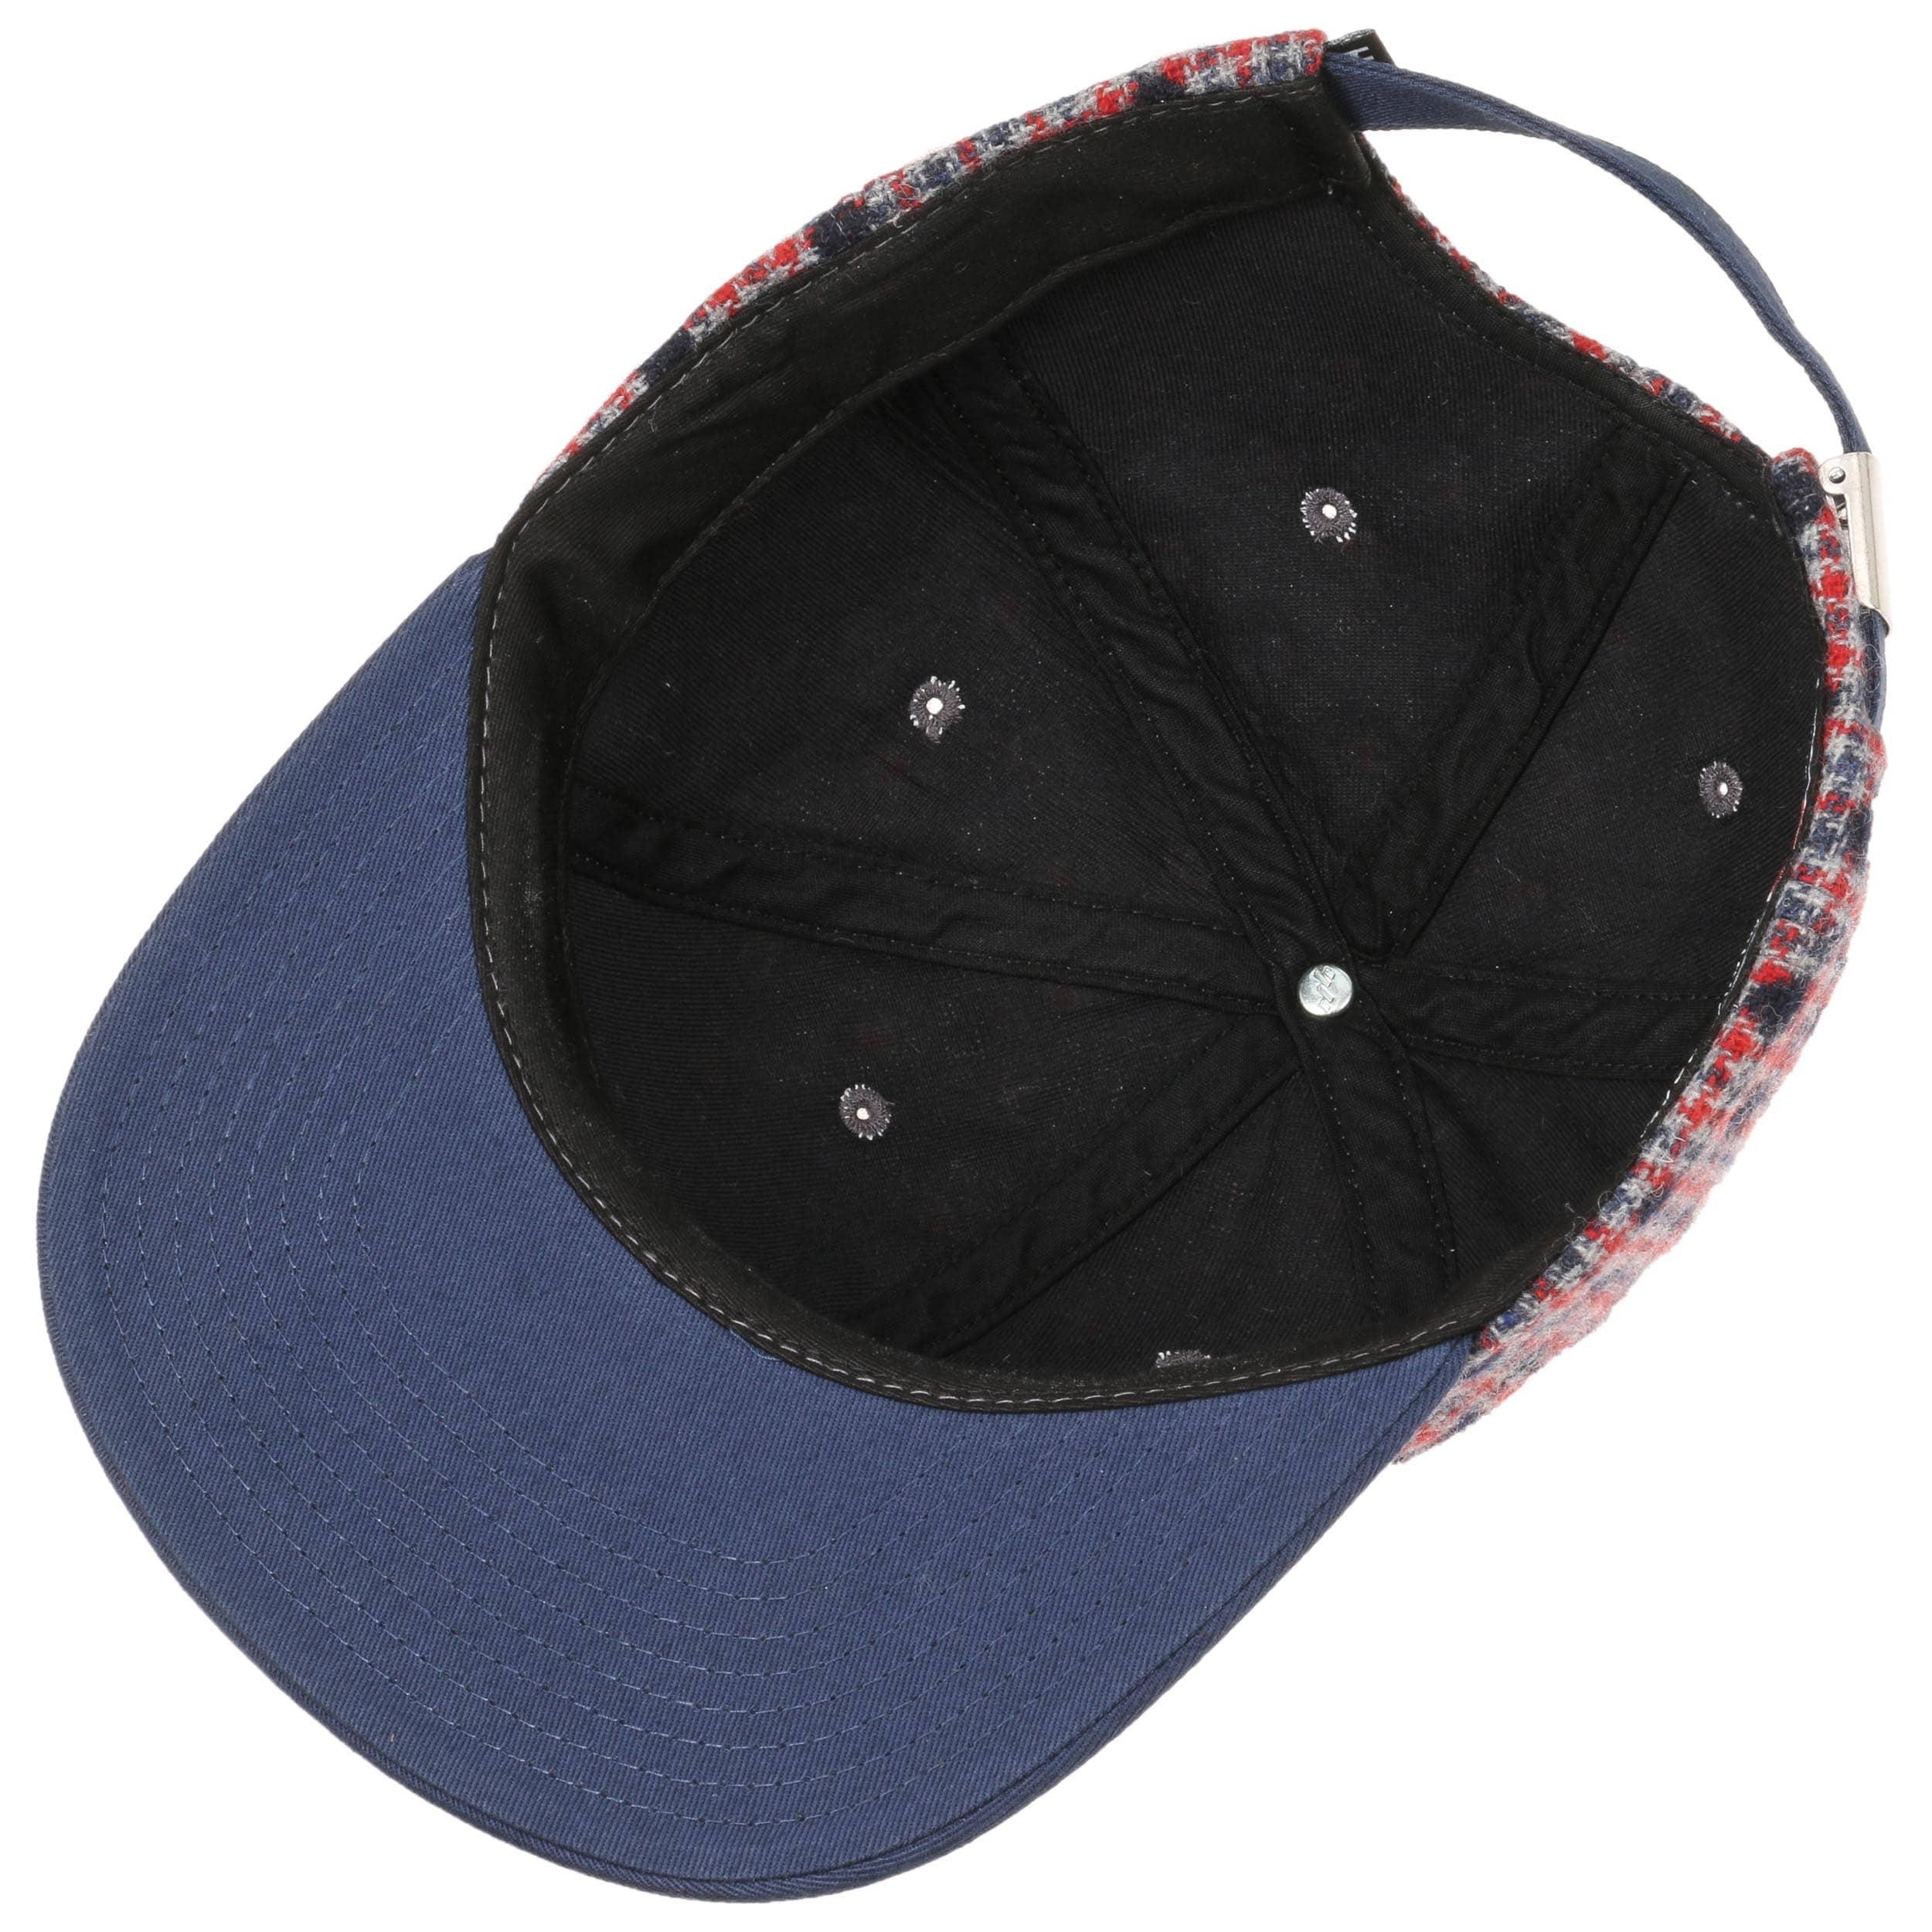 d54b5dc0b934c Gorra Wool Box Logo Strapback by HUF - Gorras - sombreroshop.es